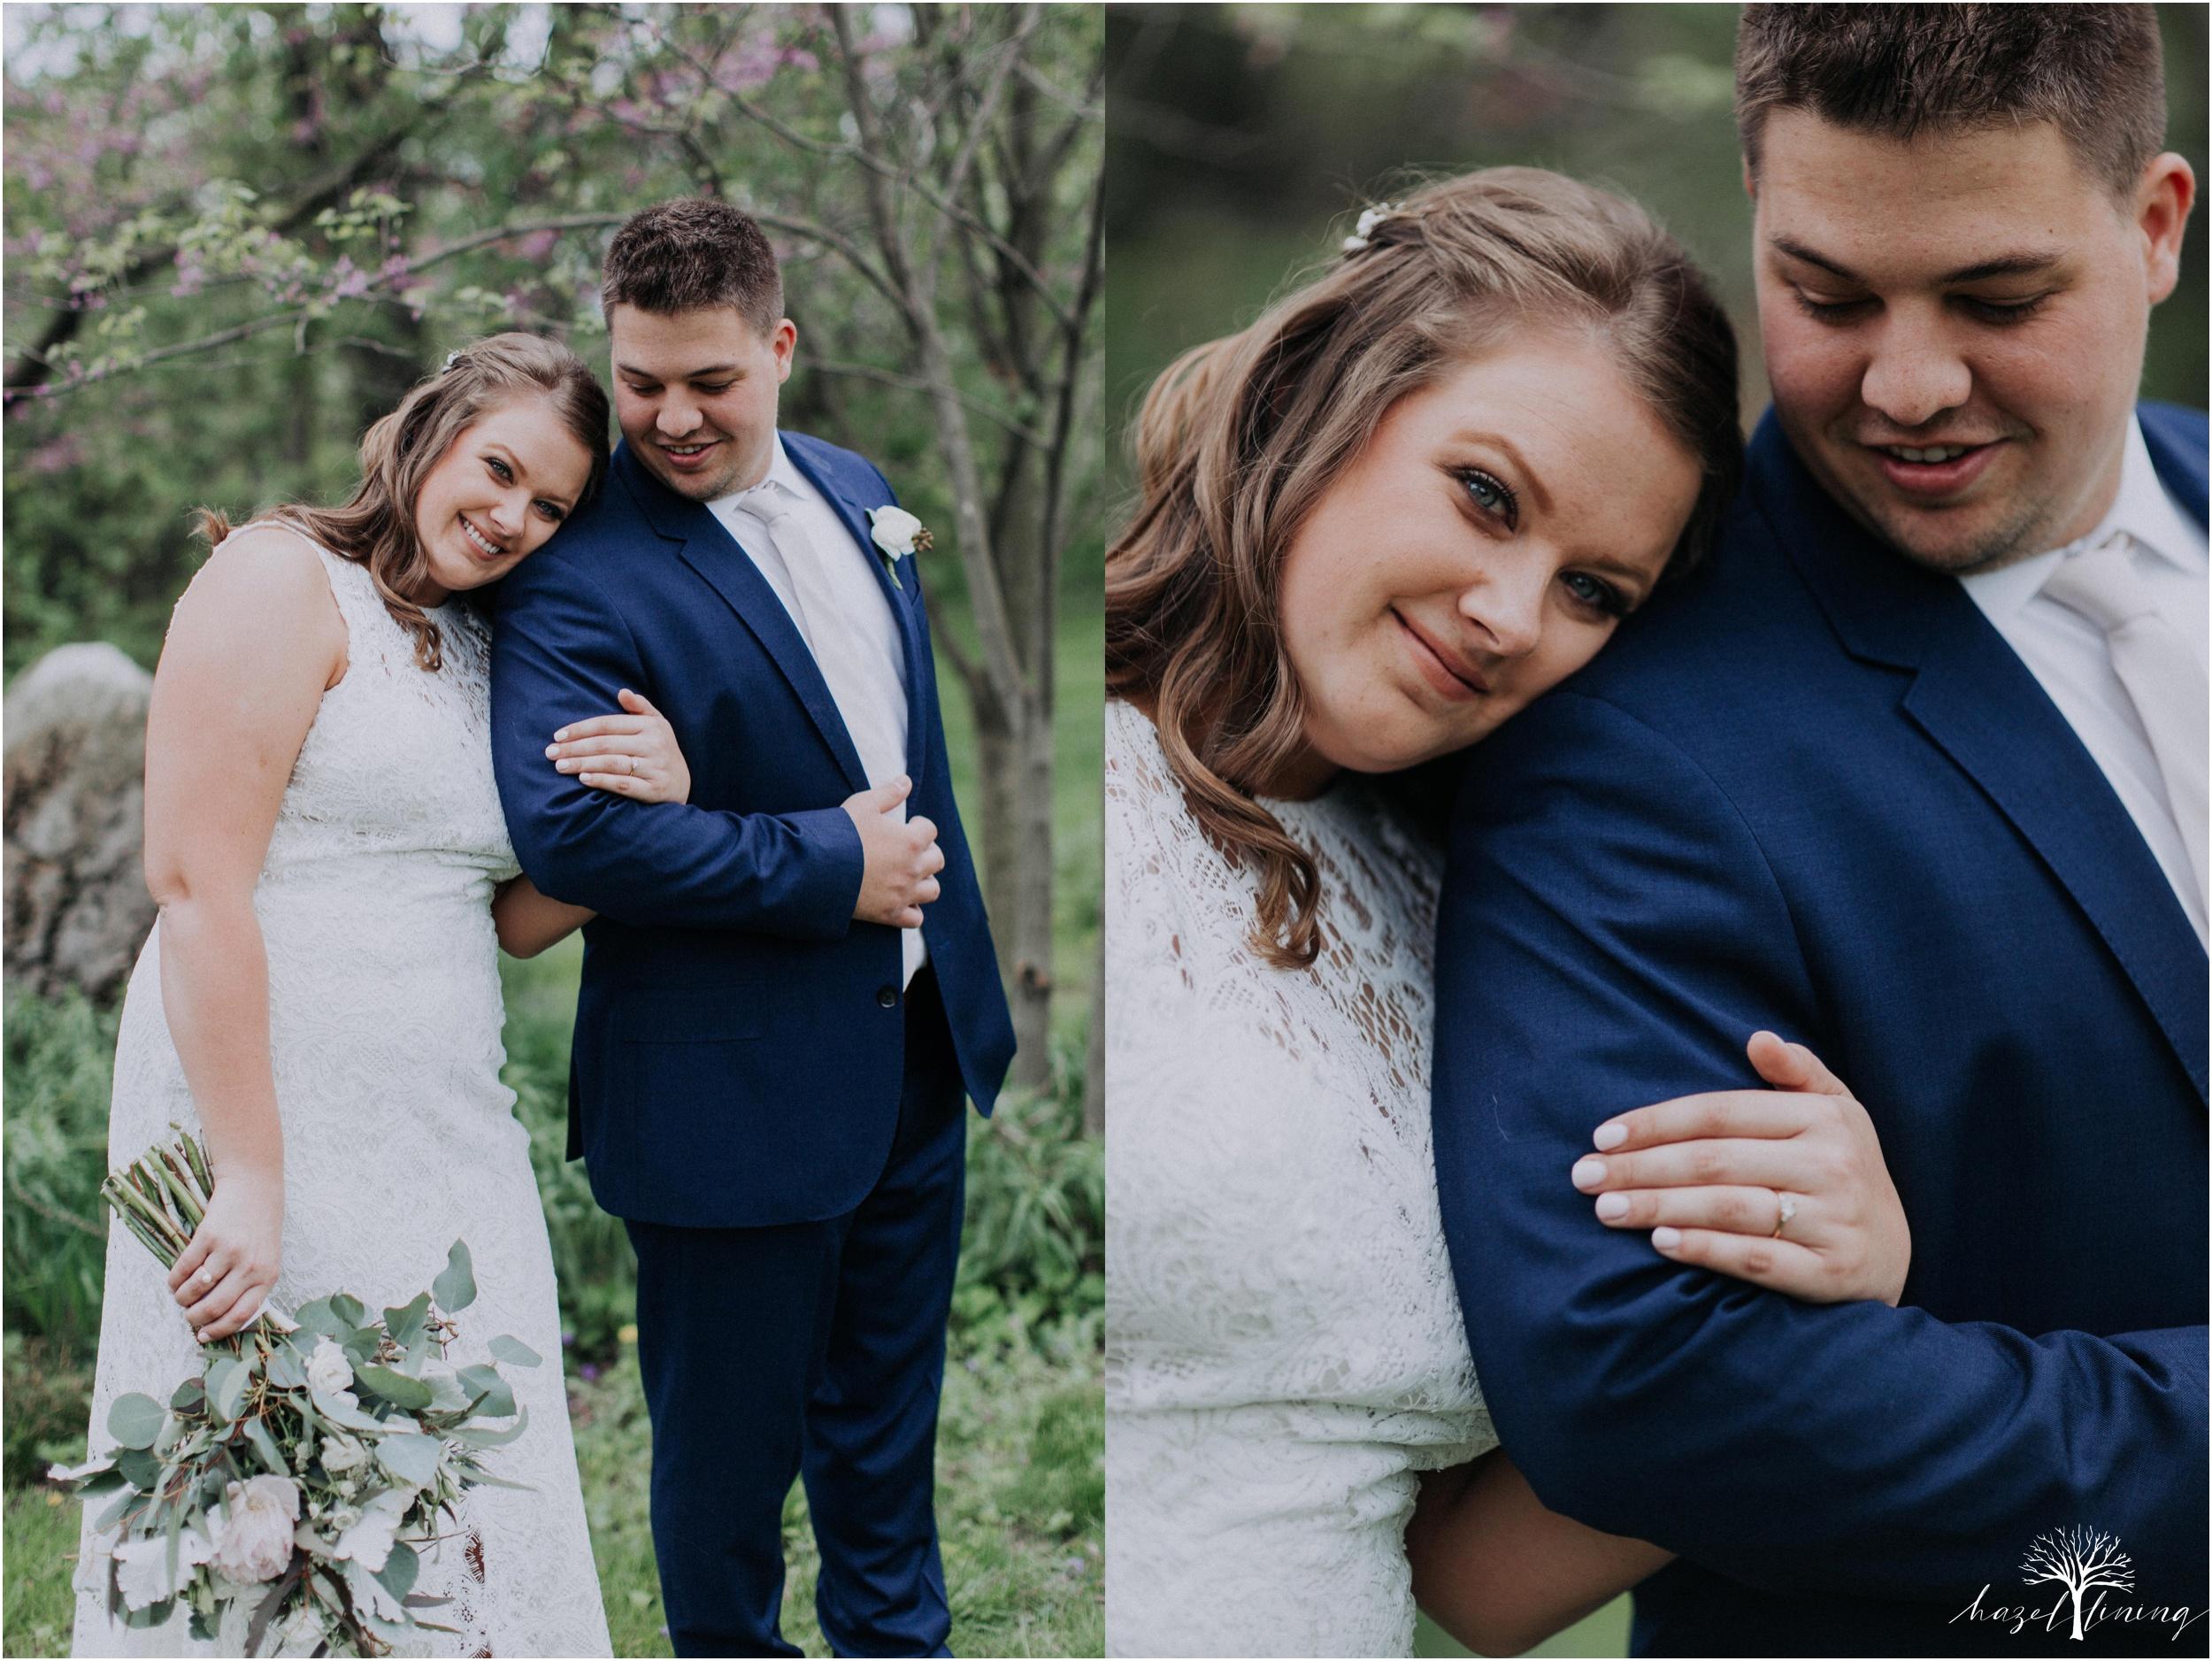 hazel-lining-travel-wedding-elopement-photography-abby-skyler-hunt-the-willis-house-york-pennsylvania-outdoor-estate-wedding_0032.jpg